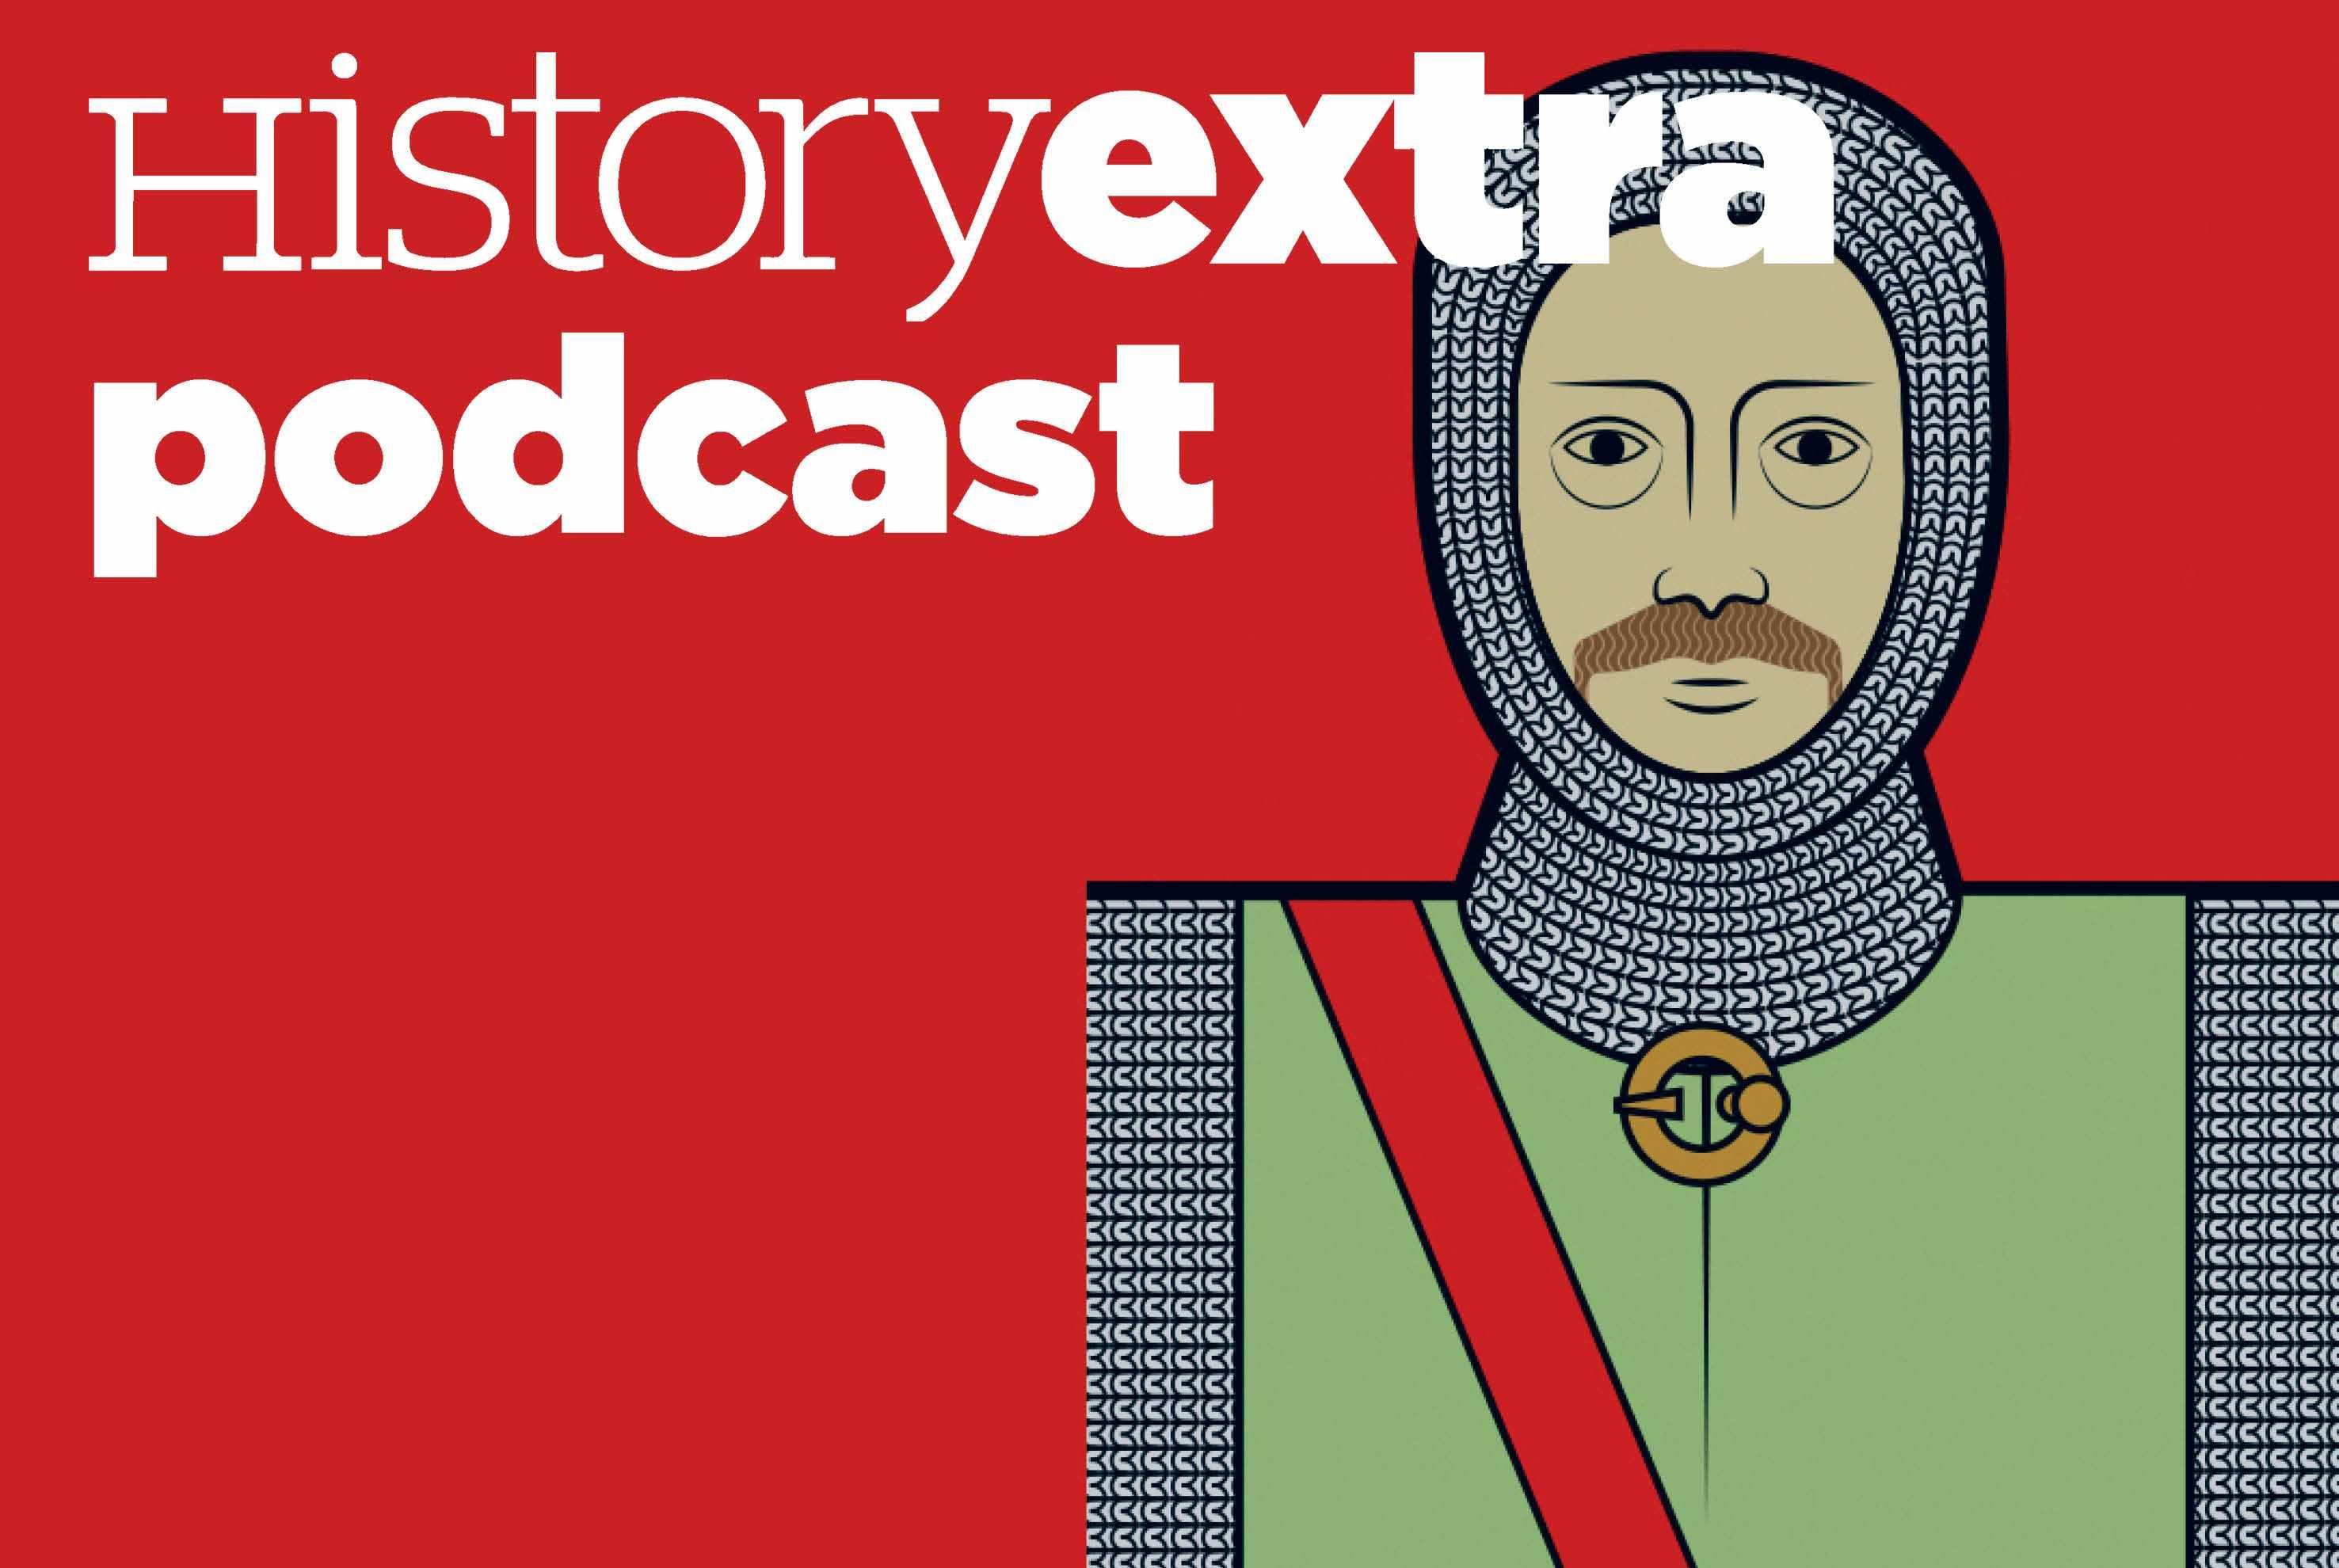 Podcast-Website-large-Thomas-Asbridge-c124f9f